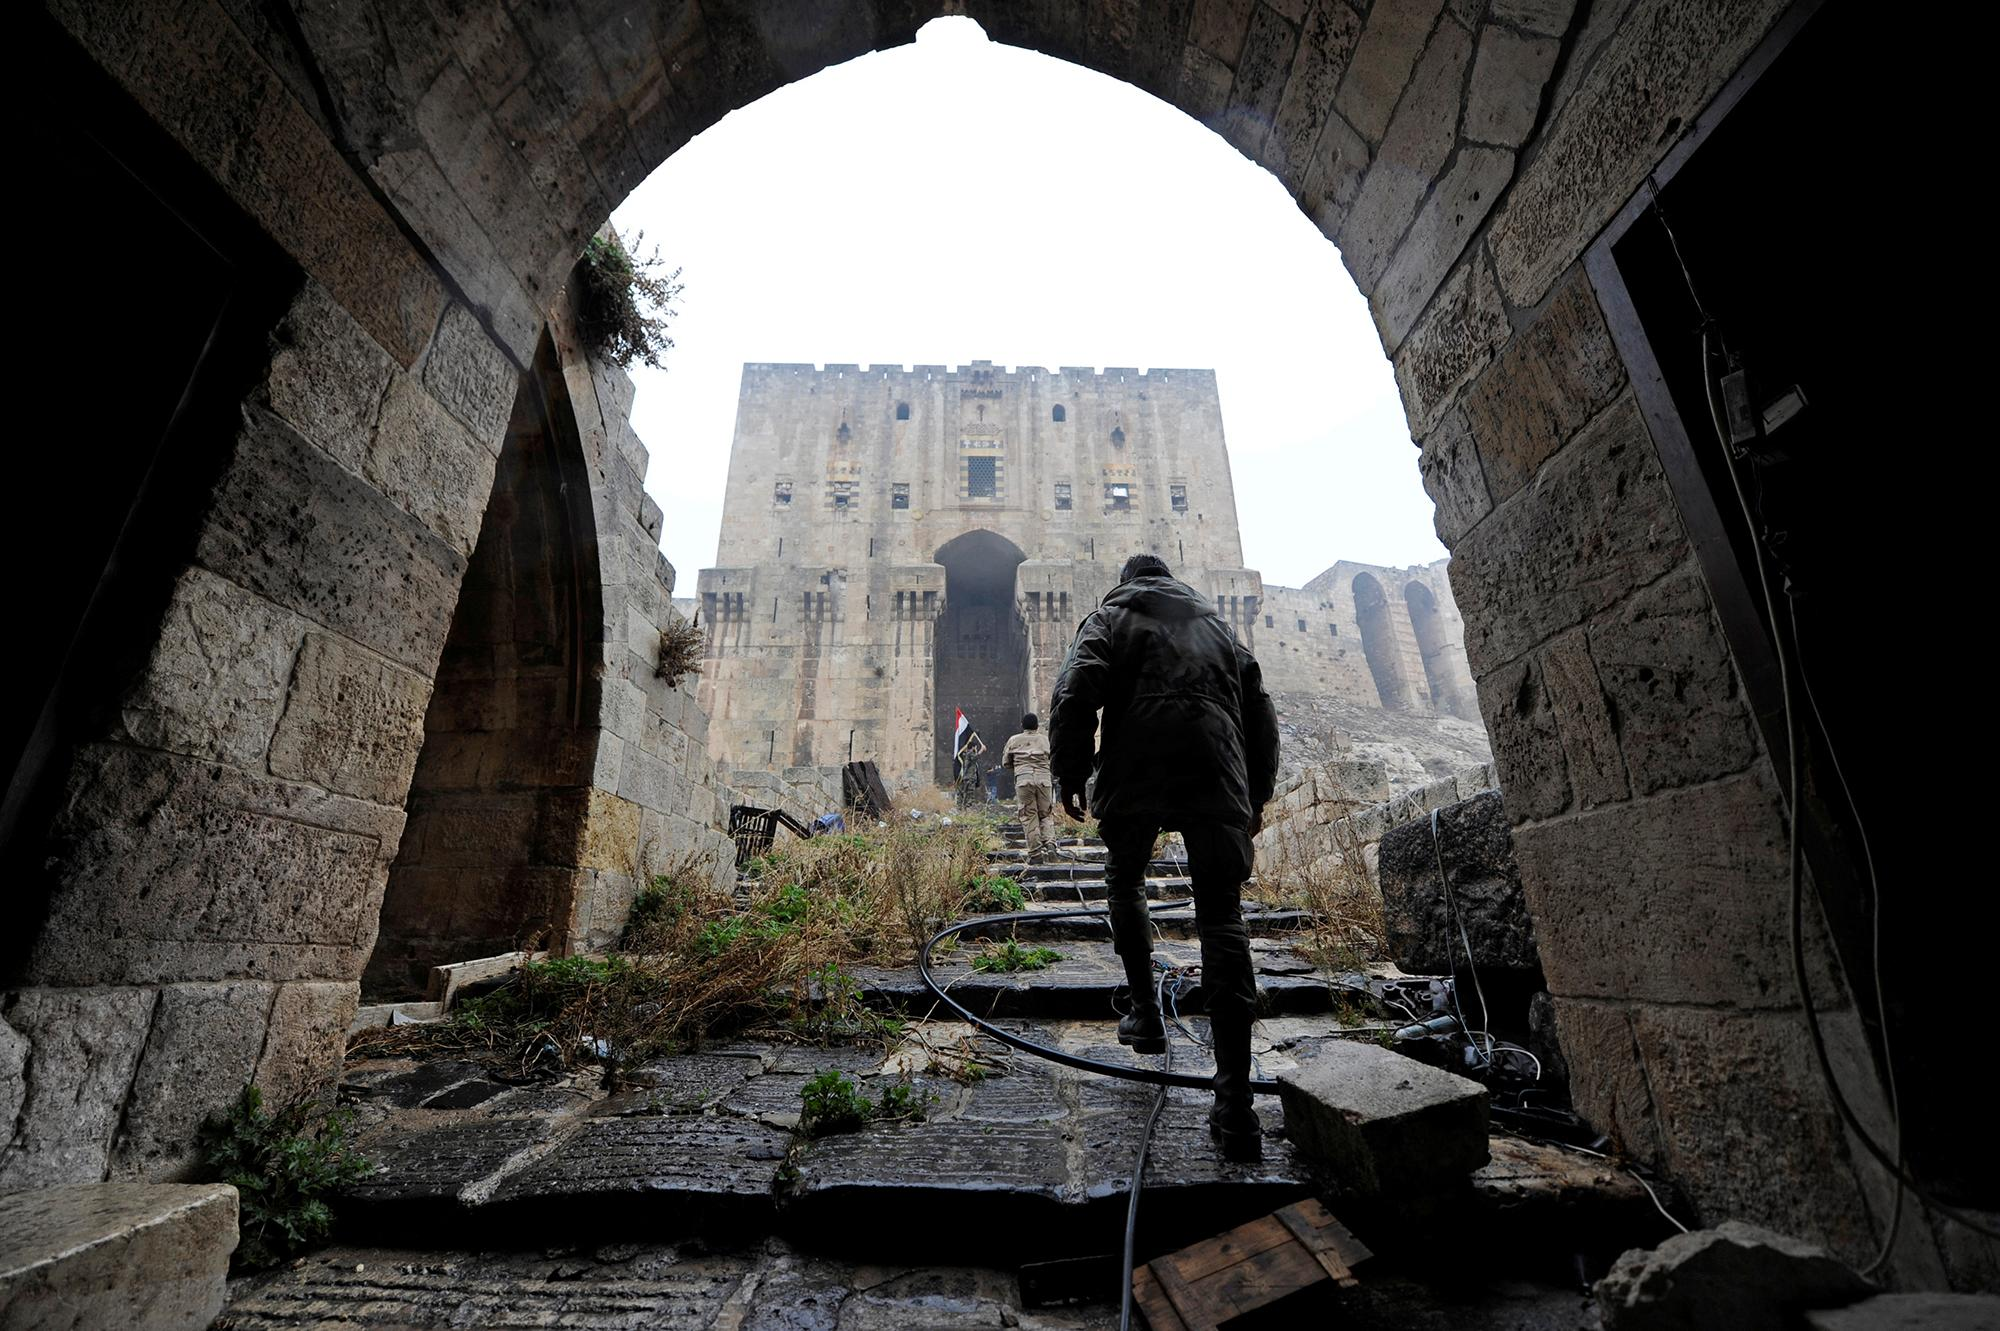 <p>Forces loyal to Syria's President Bashar al-Assad walk inside Aleppo's historic citadel, during a media tour, Syria on Dec.13, 2016. (Omar Sanadiki/Reuters) </p>